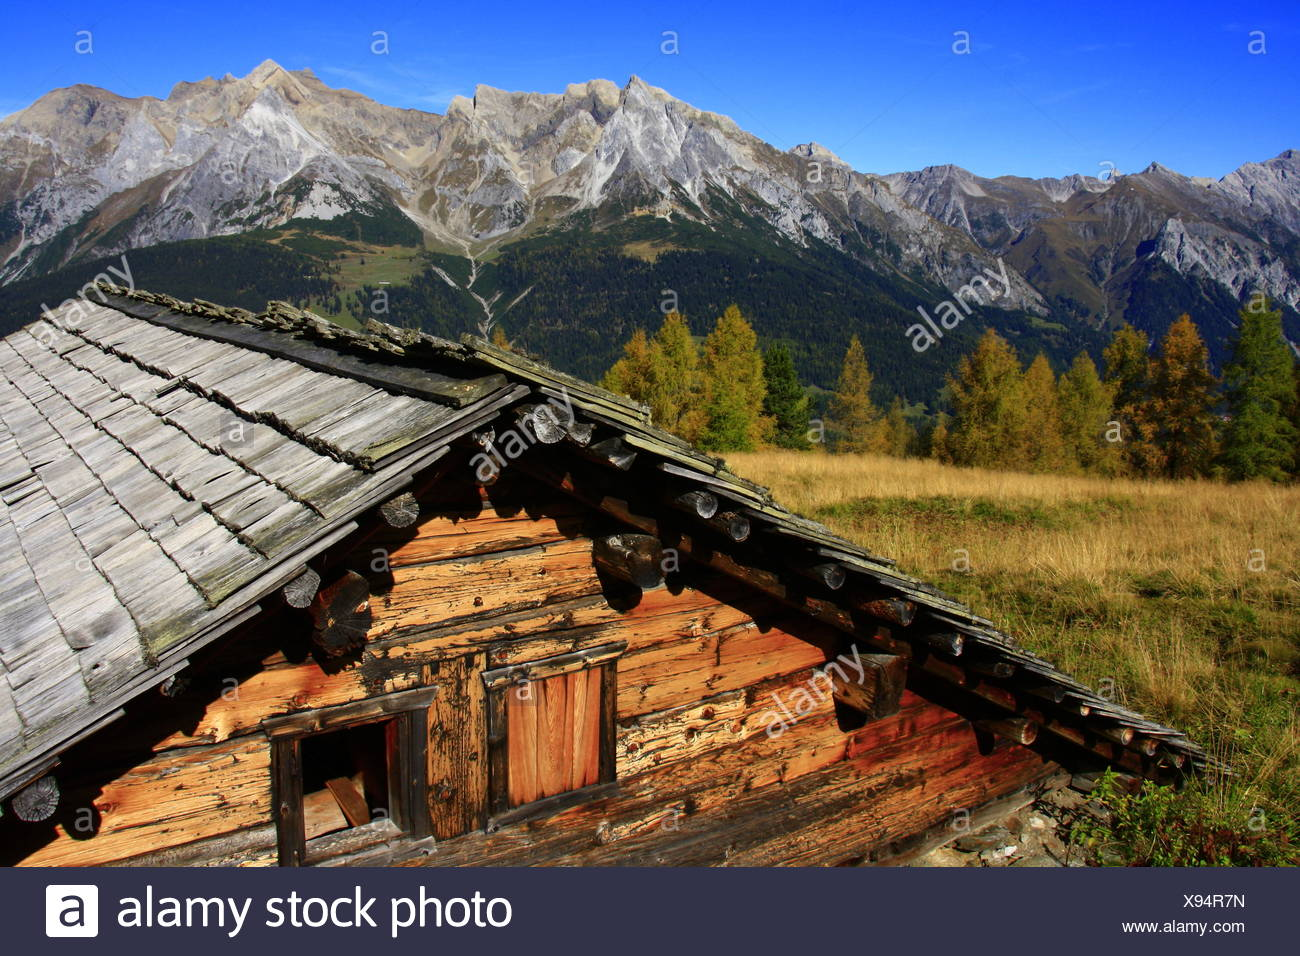 Old tyrolean alpine cabin - Stock Image